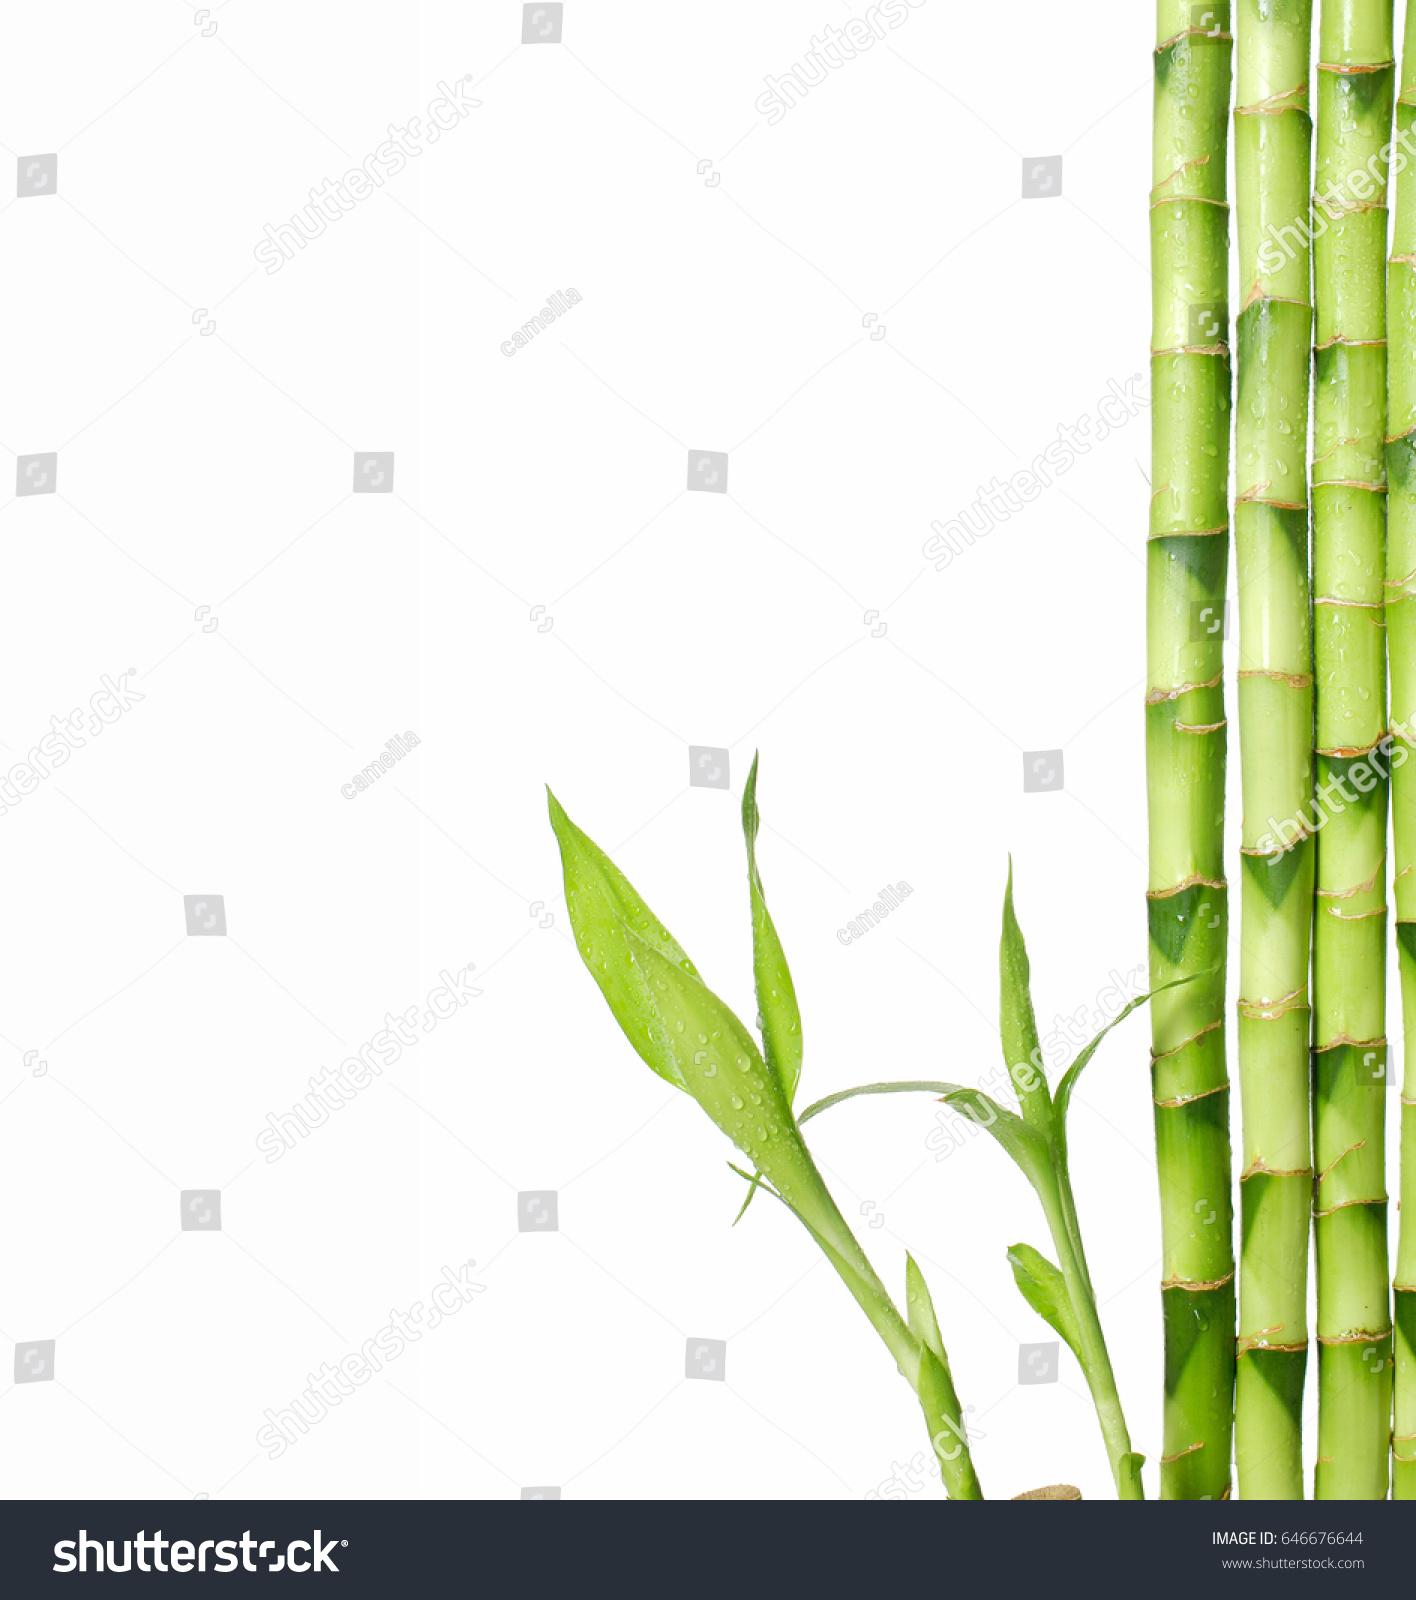 Bamboo Isolated On White Background Stock Photo (Royalty Free ...